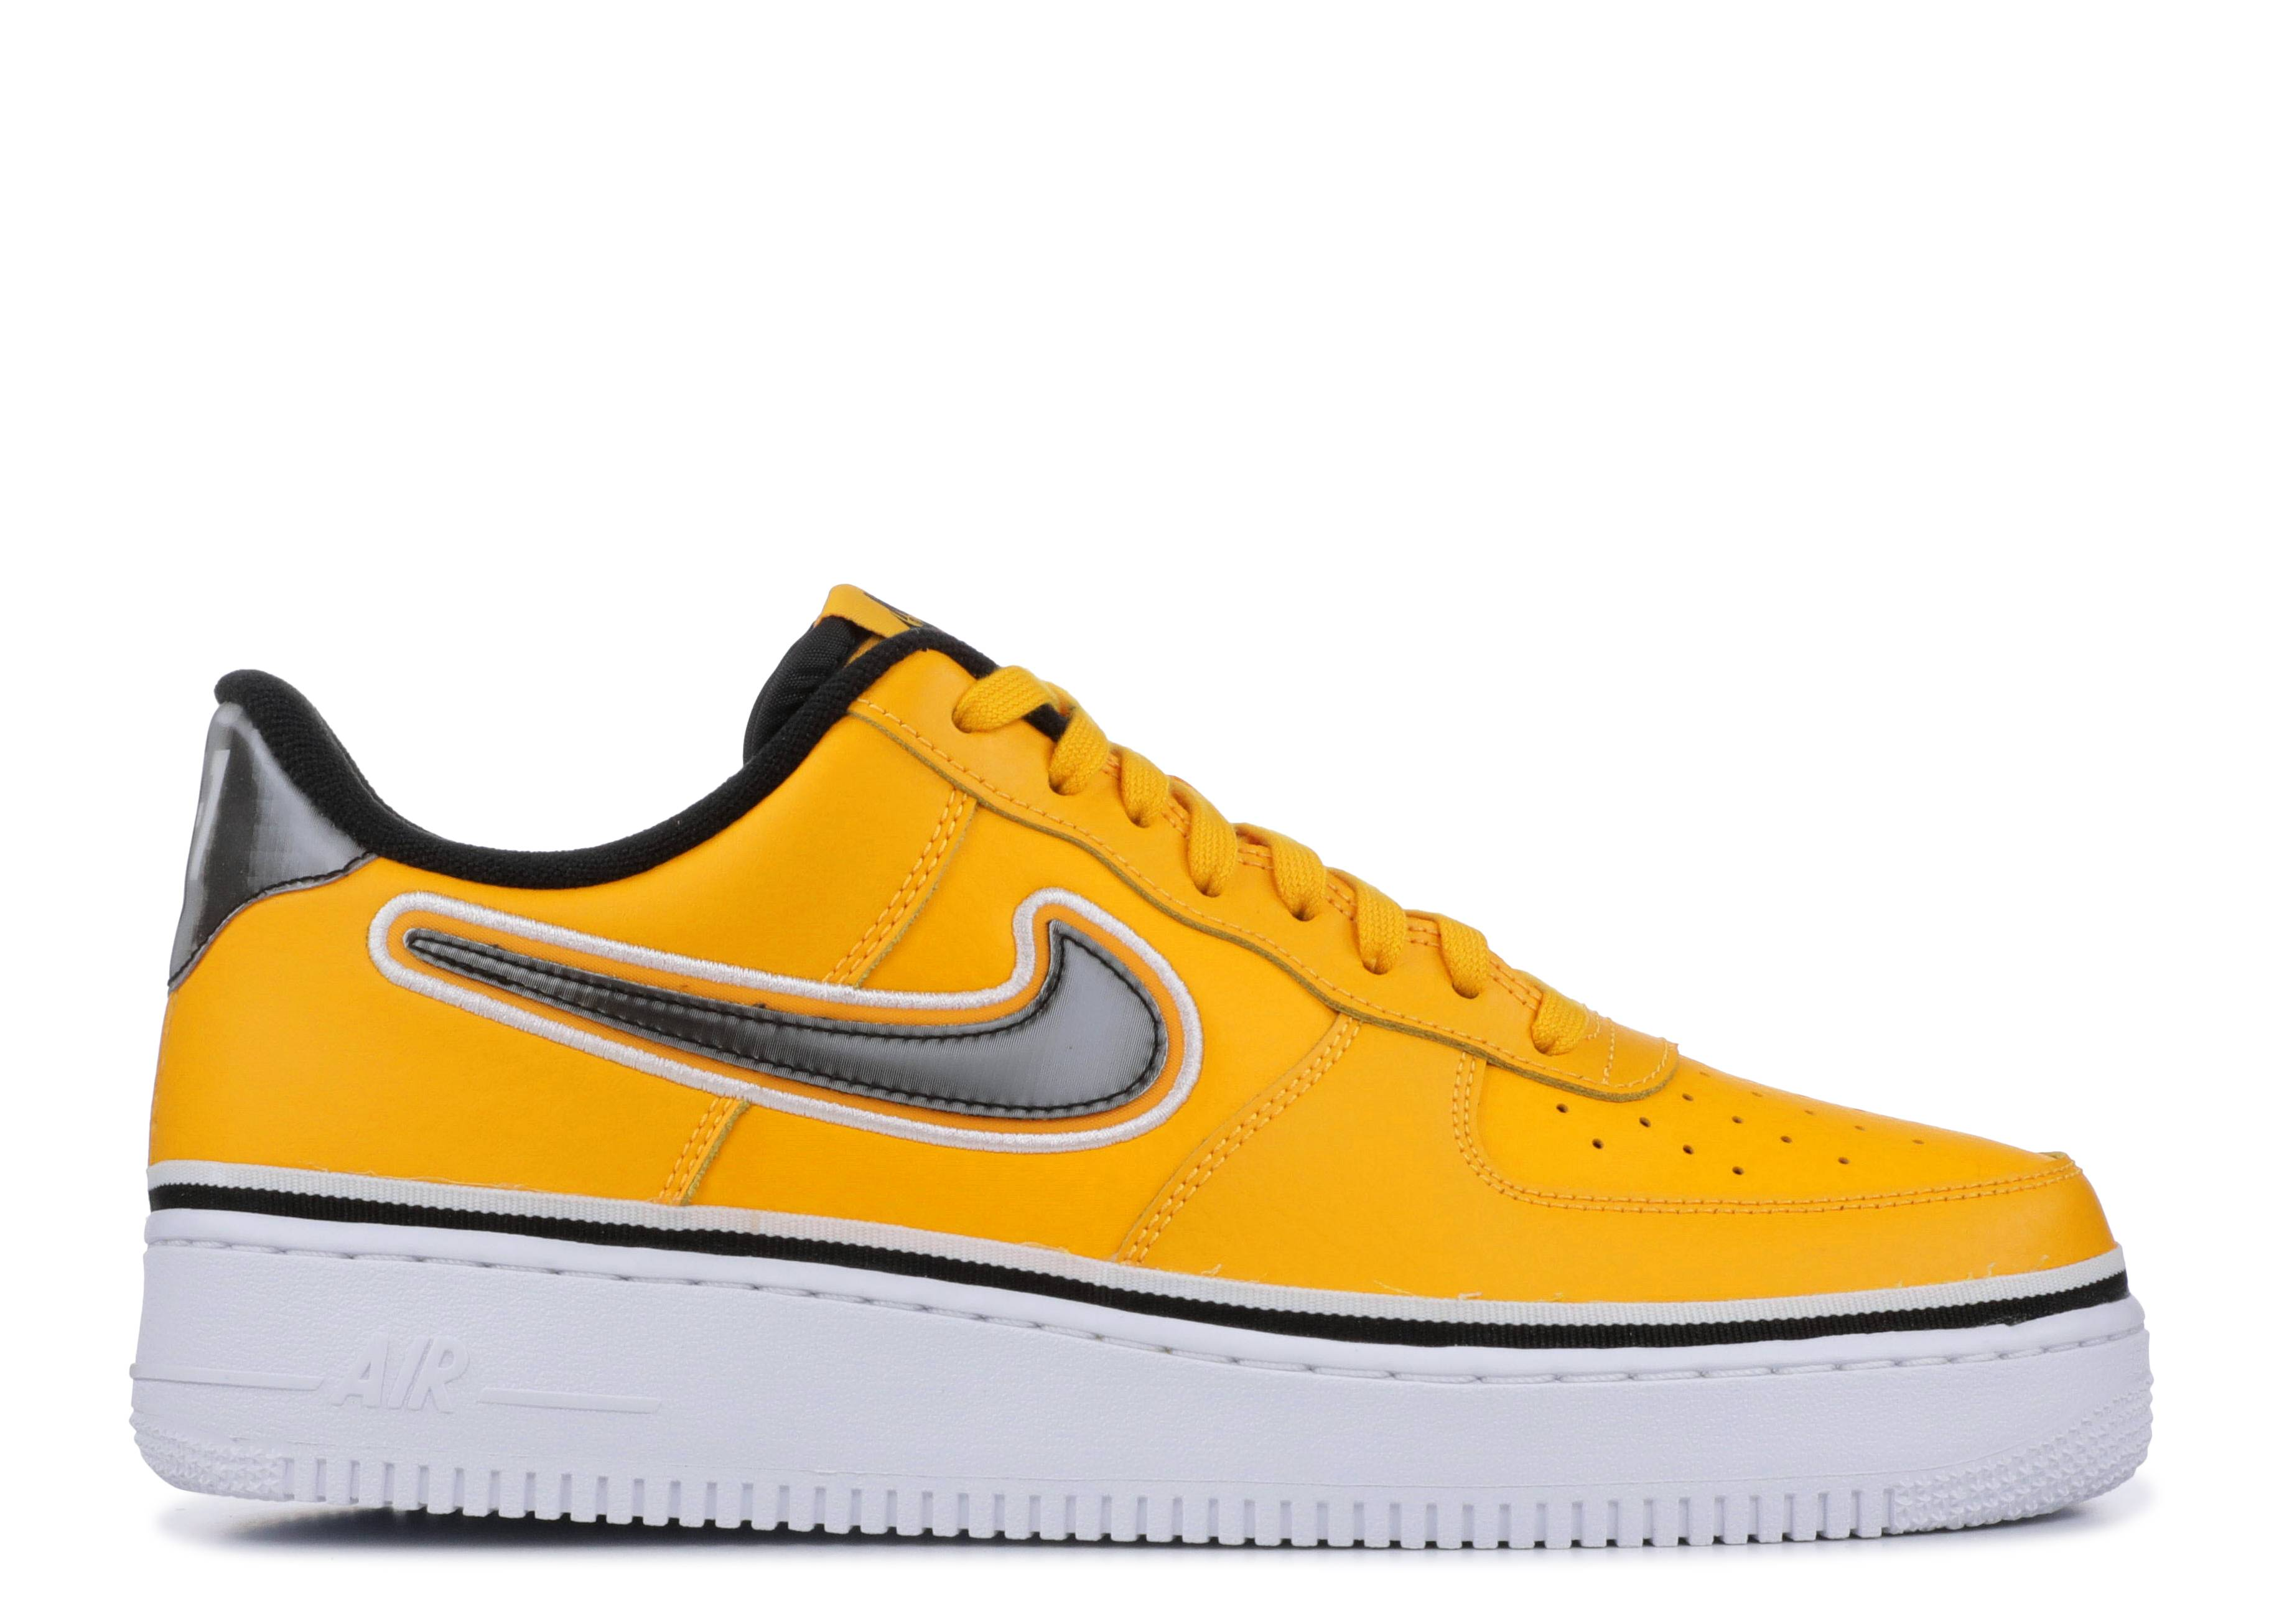 Nike Air Force 1 Lv8 Sport